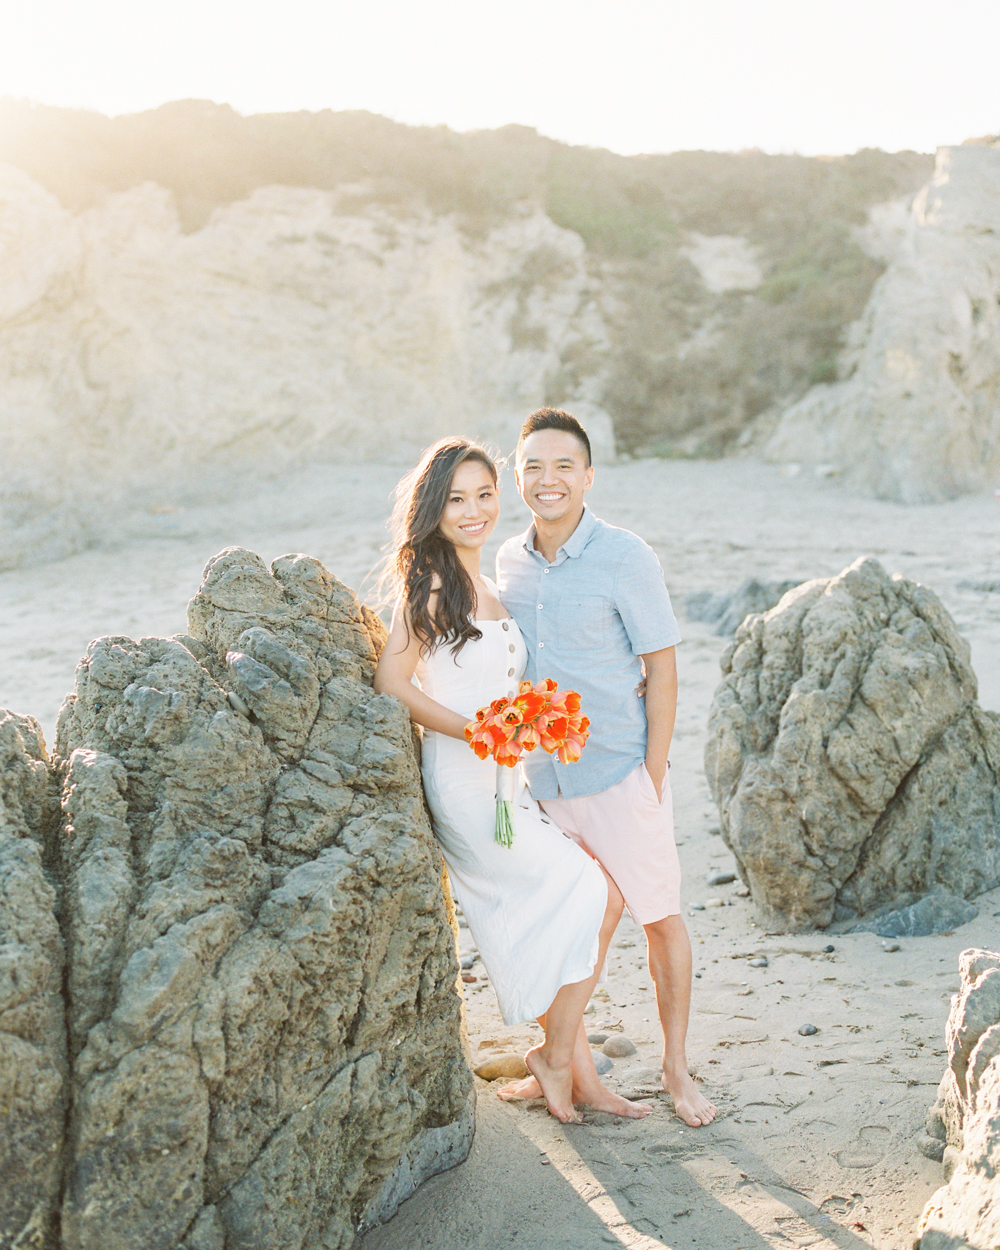 Leo_Carillo_Beach_Malibu_Engagement_Session_Anya_Kernes-4.jpg